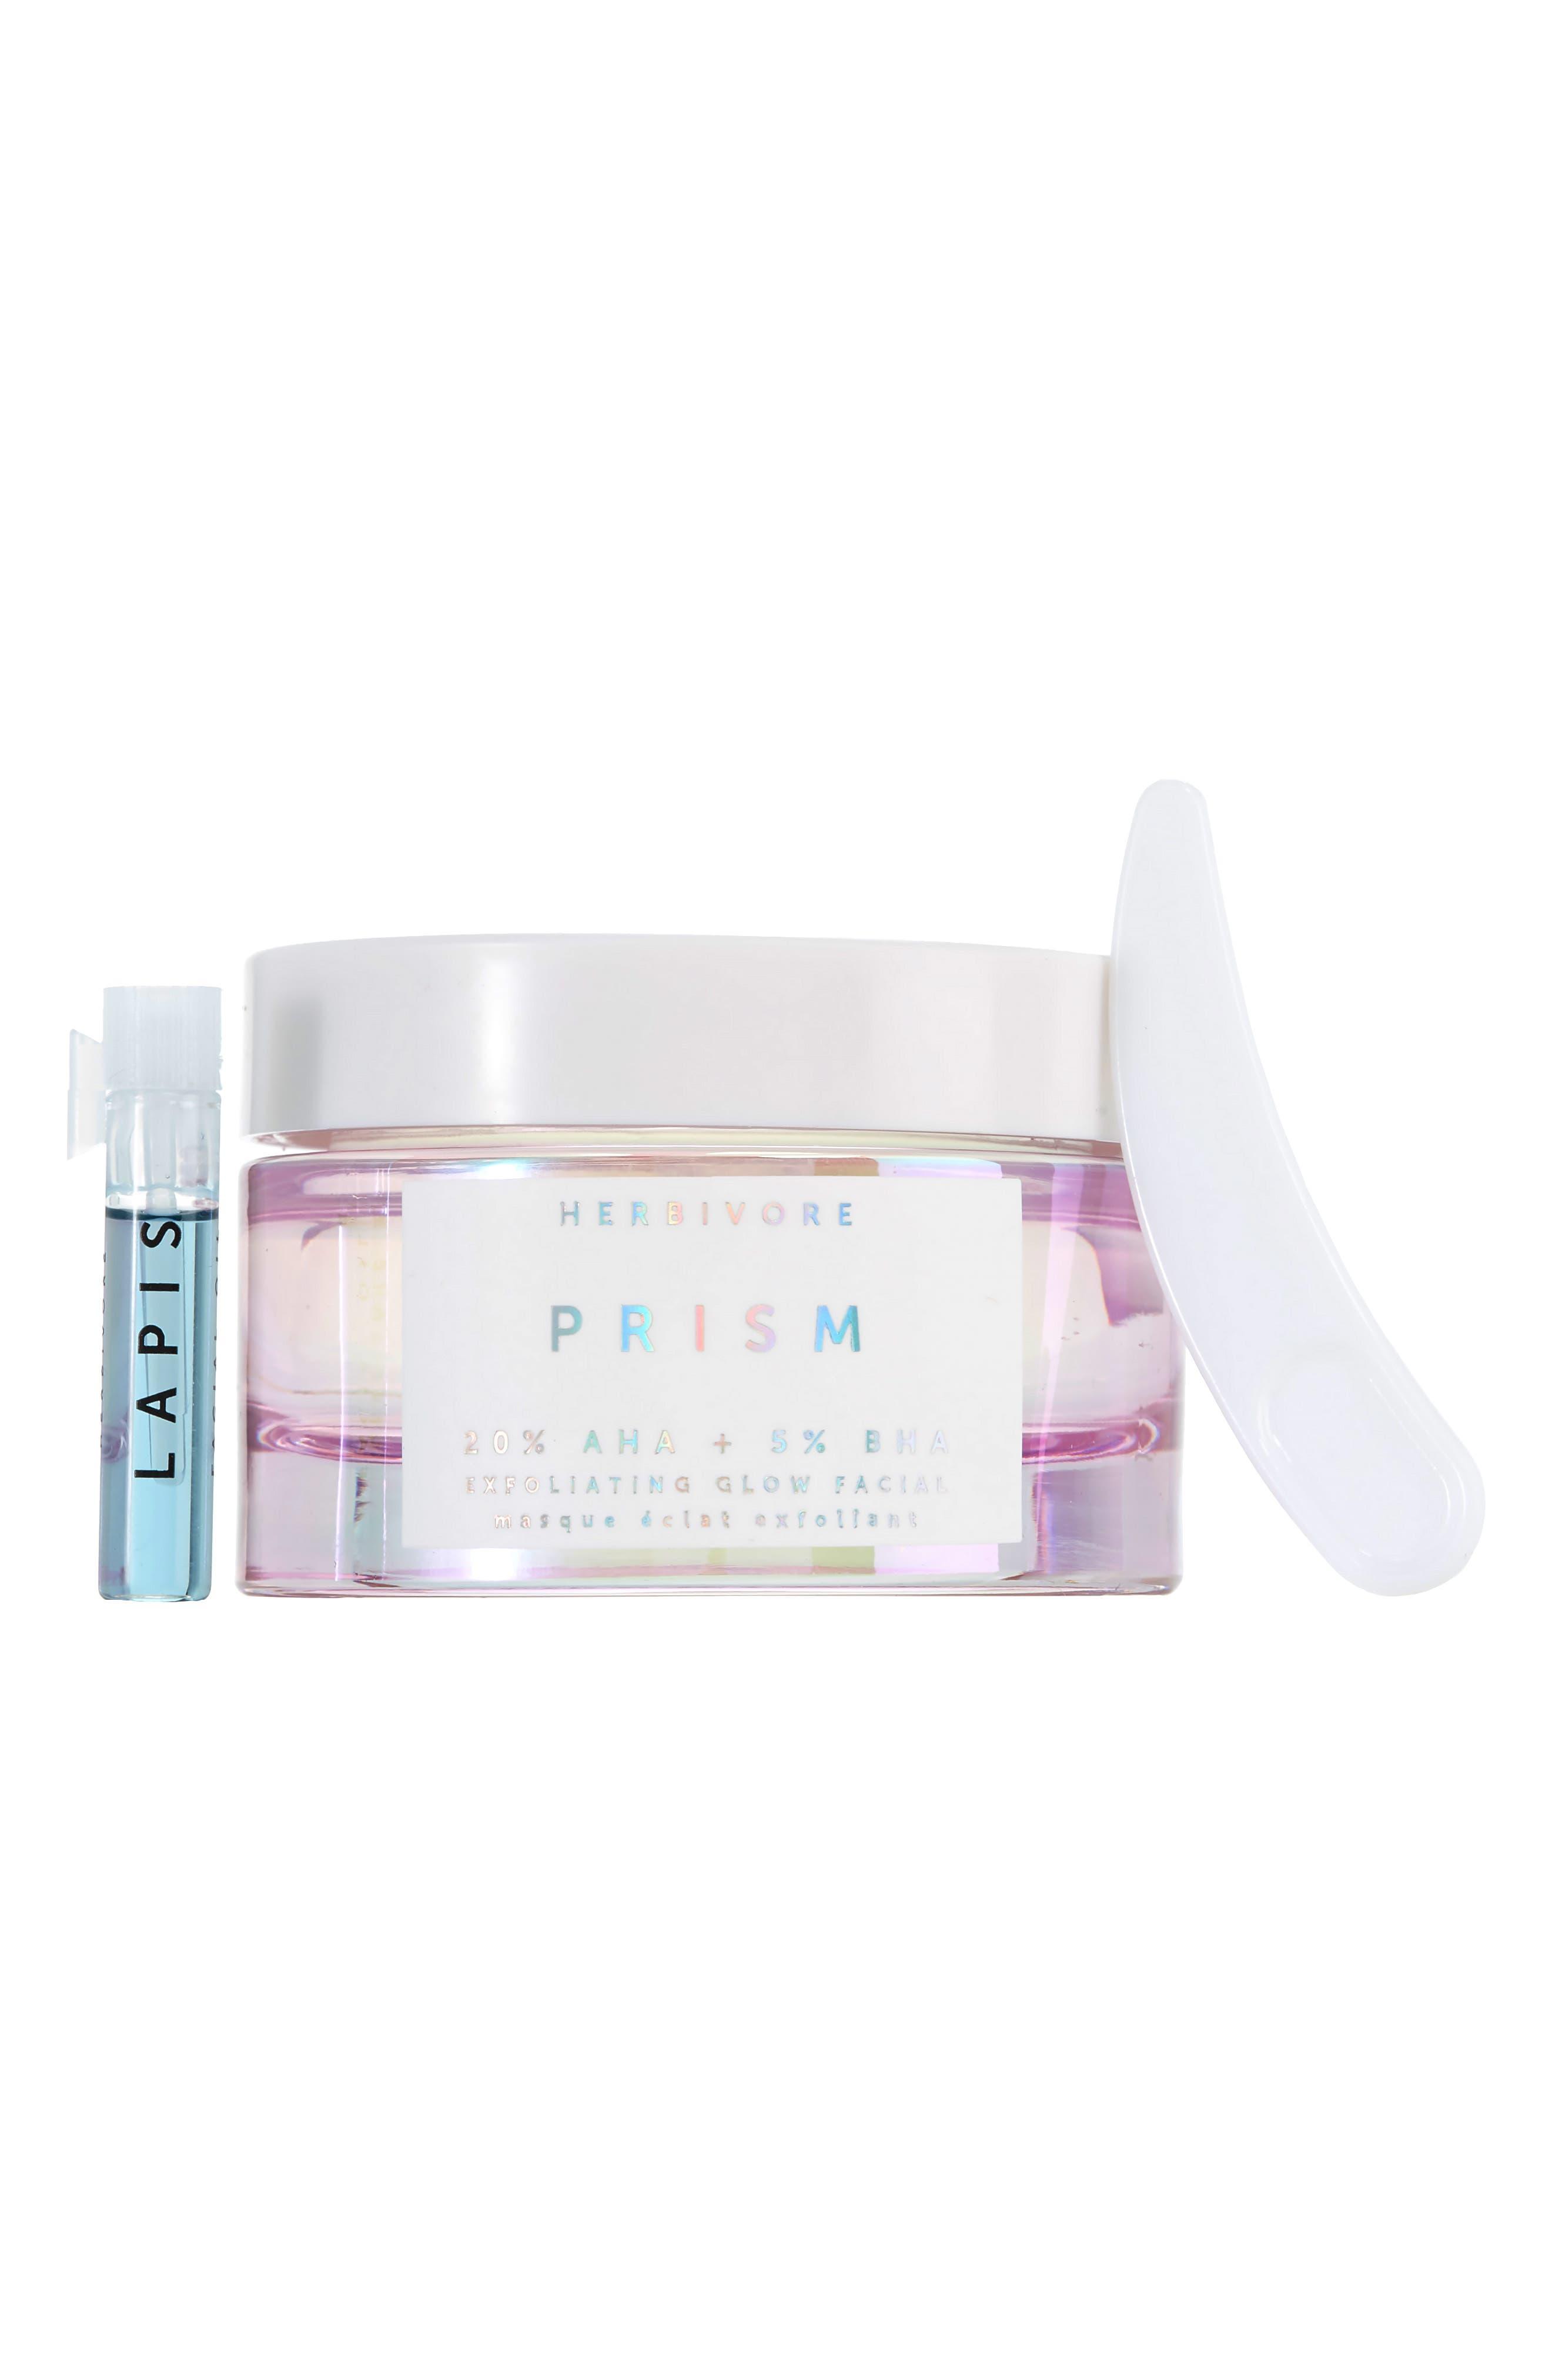 Prism 20% Aha + 5% Bha Exfoliating Glow Facial Mask